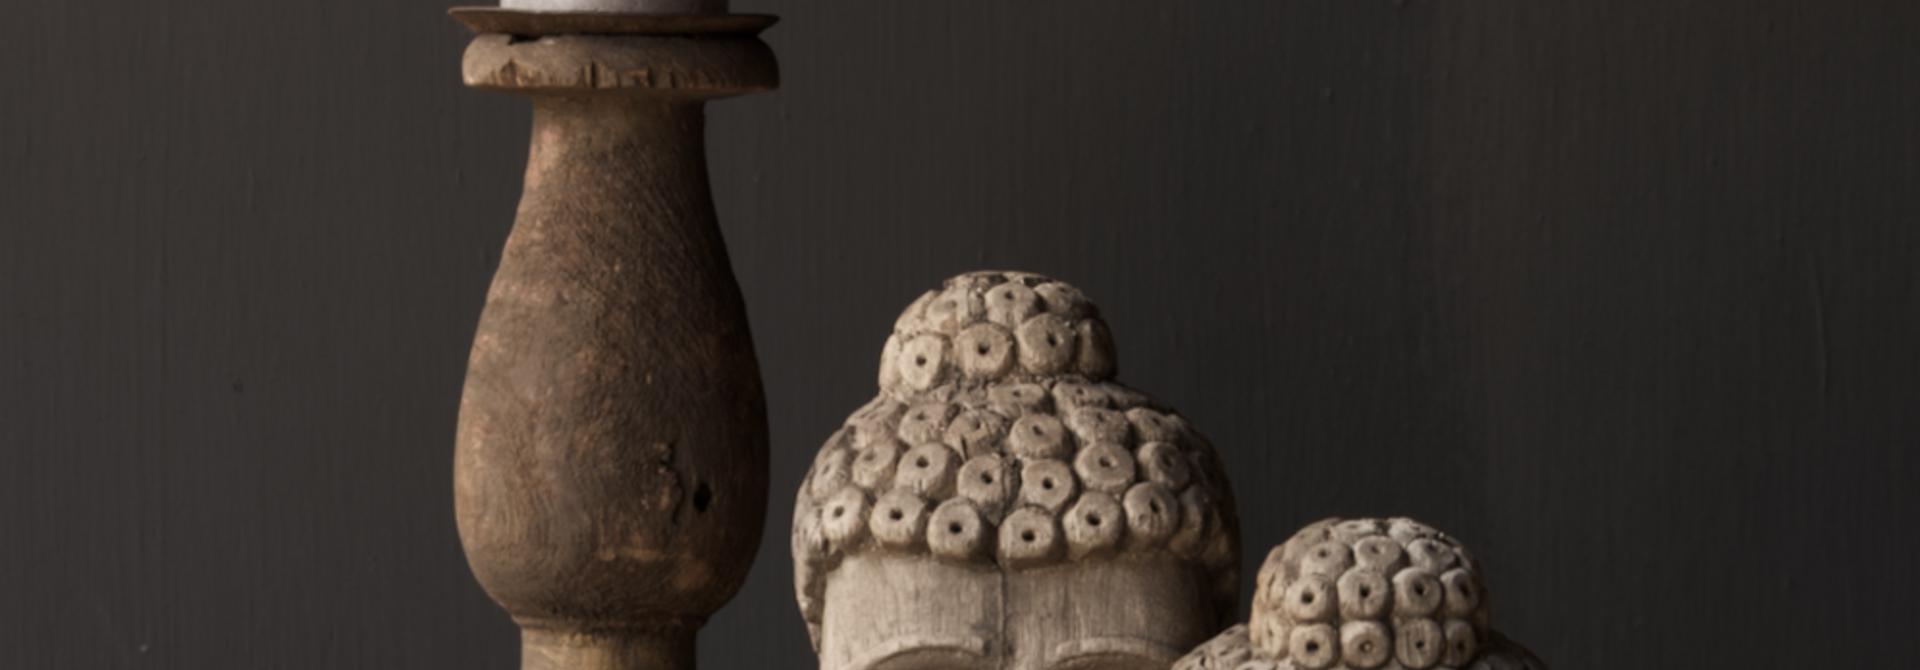 Oud vergrijsd houten buddha hoofd